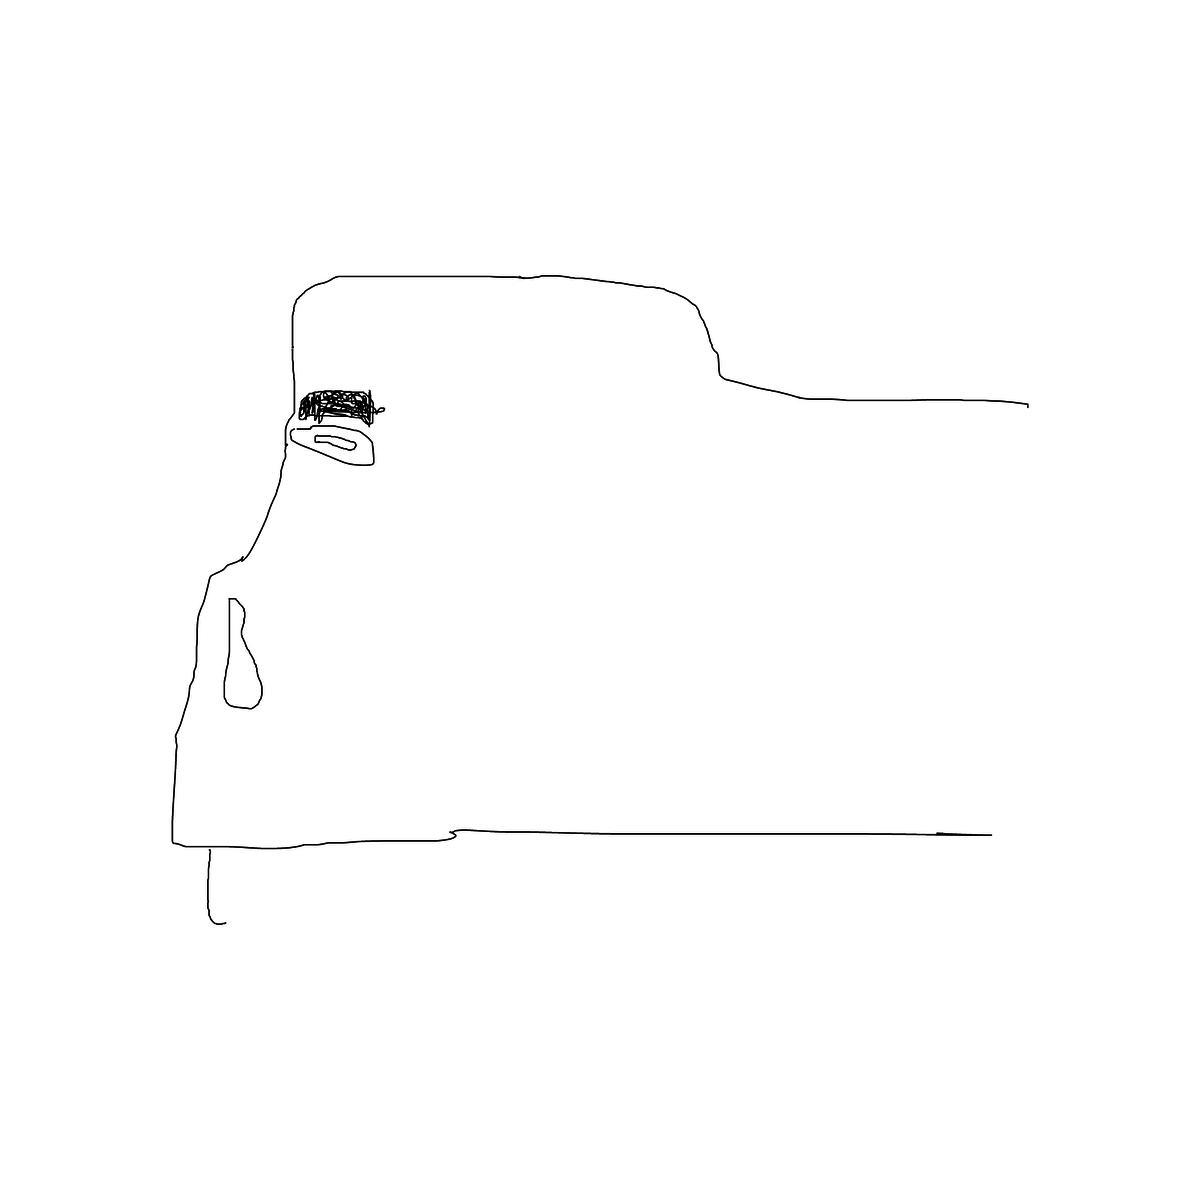 BAAAM drawing#23730 lat:46.5347633361816400lng: 6.3308410644531250